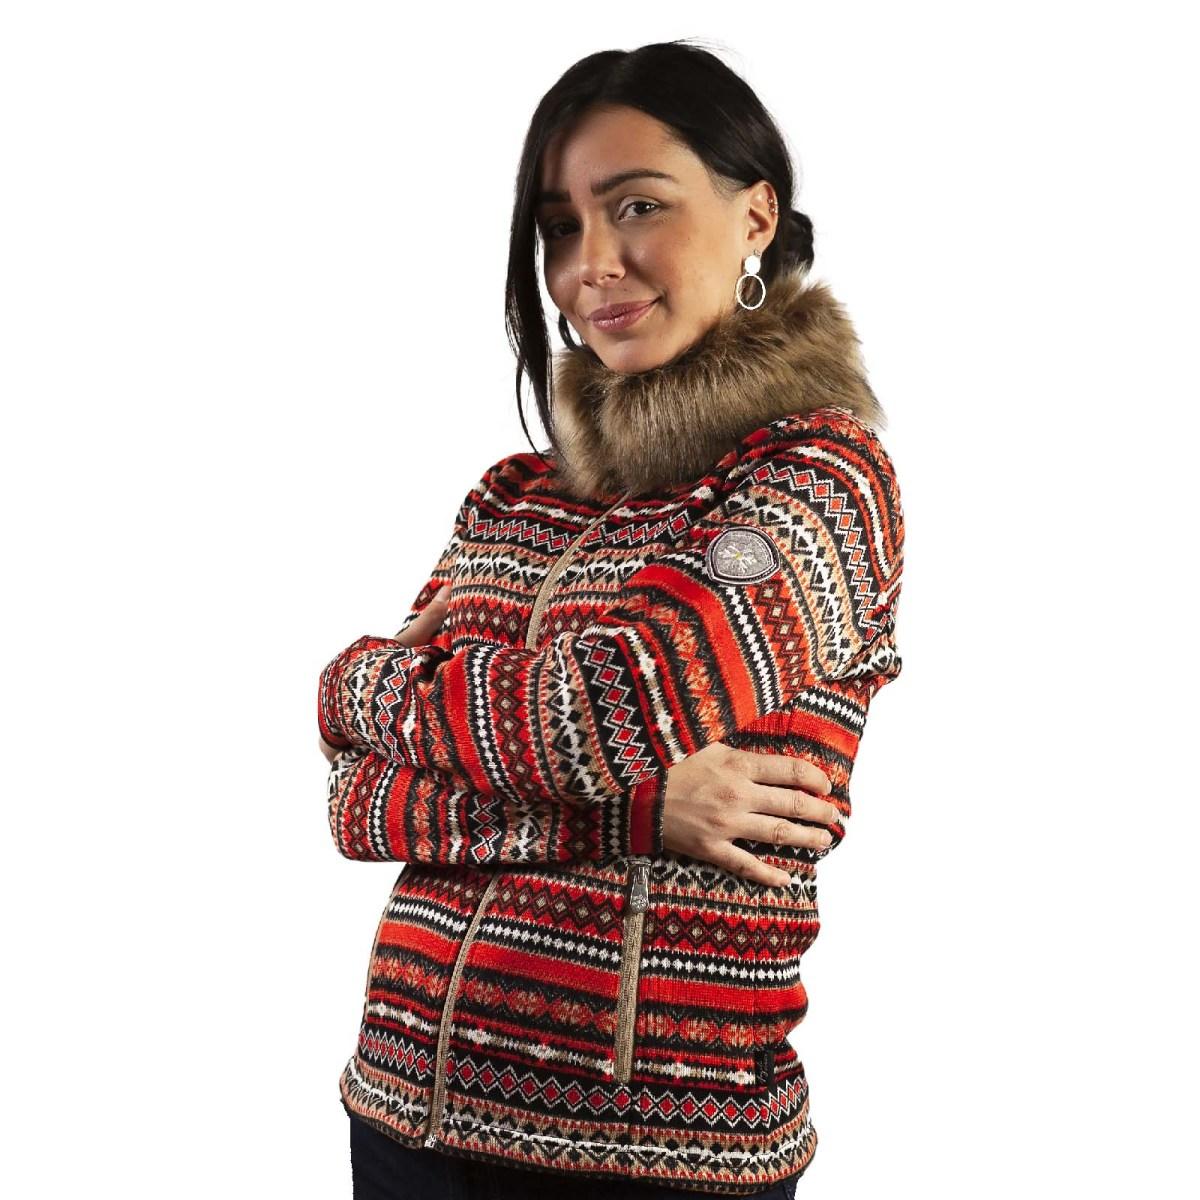 veste polaire femme angele sportswear Cassis fourrure rouge